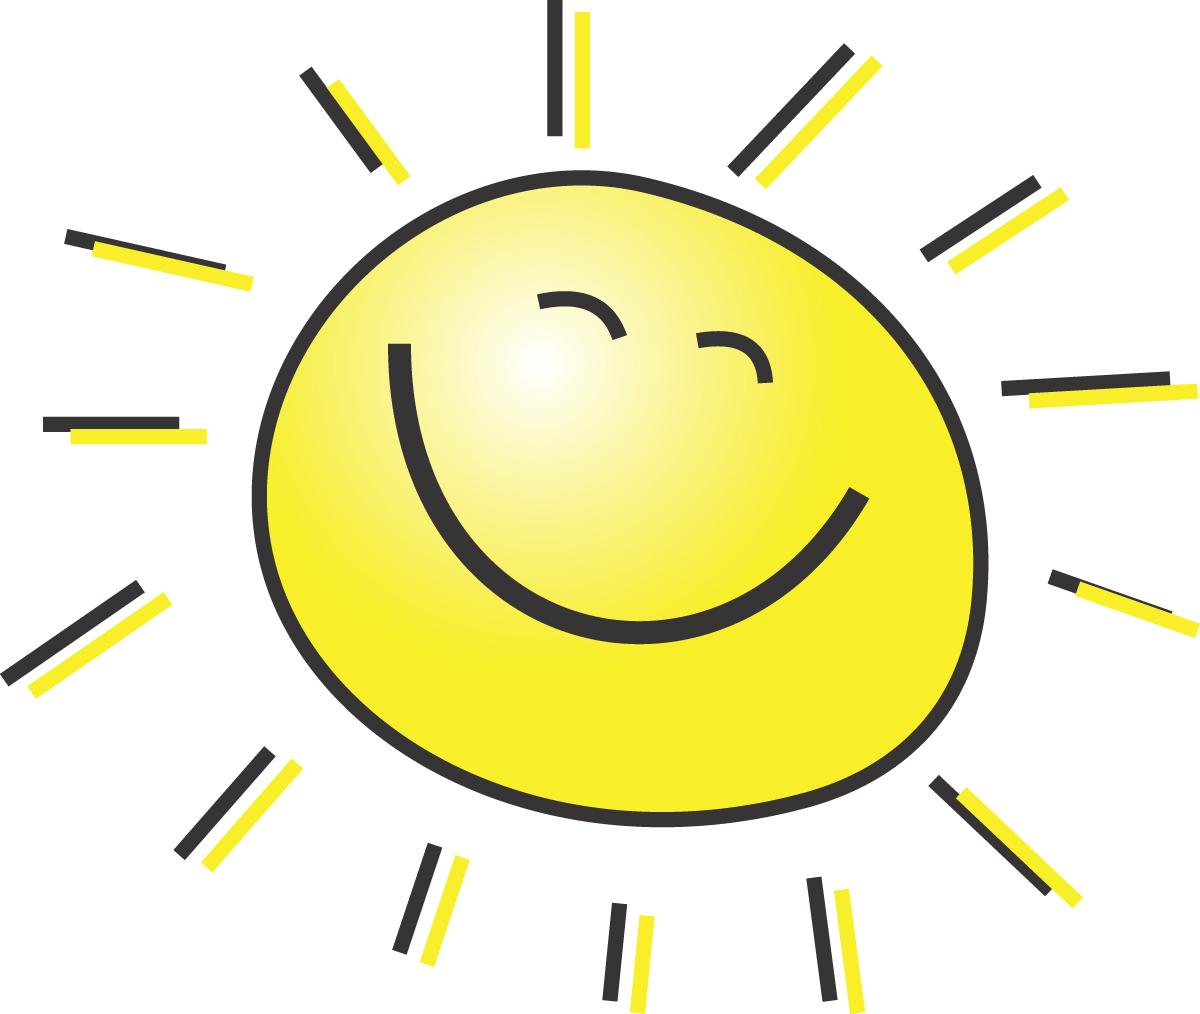 Sun With Sunglasses Clipart   Clipart li-Sun With Sunglasses Clipart   Clipart library - Free Clipart Images-14